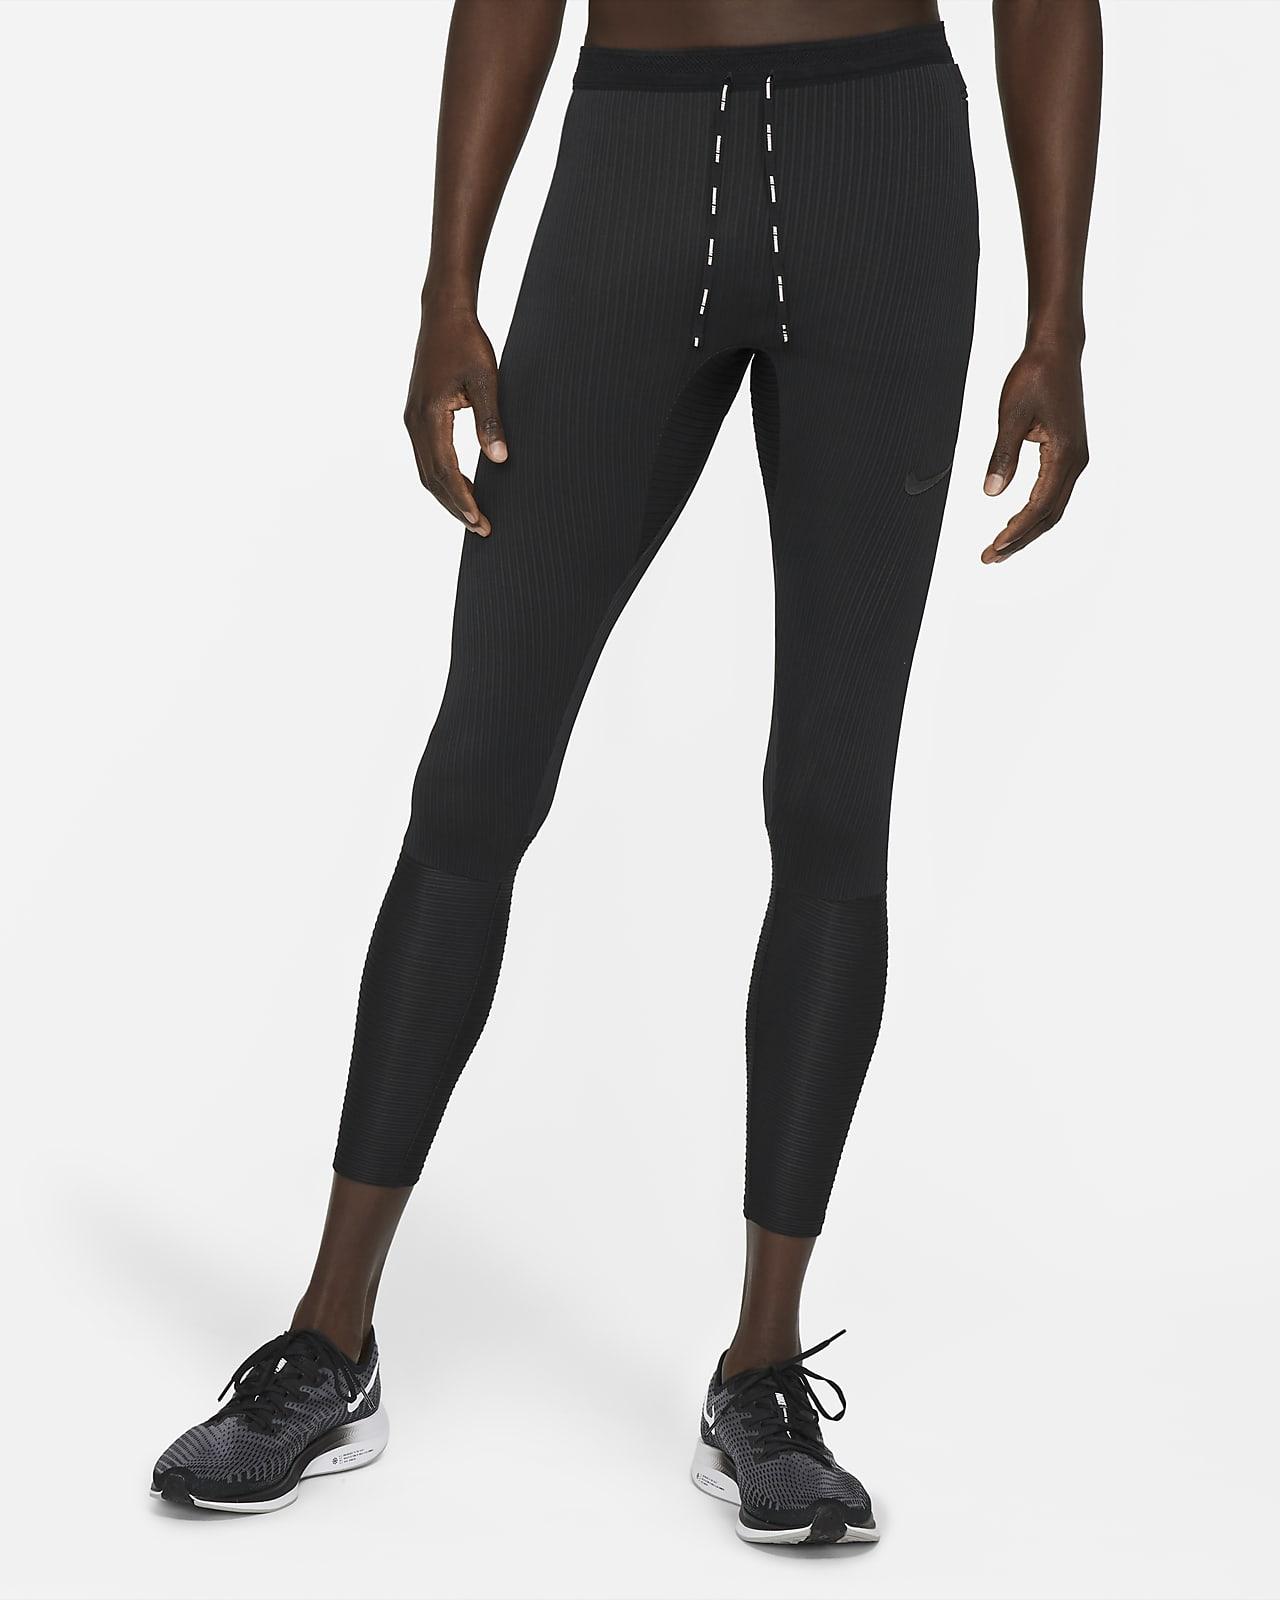 Mallas de running para hombre Nike Dri-FIT Swift